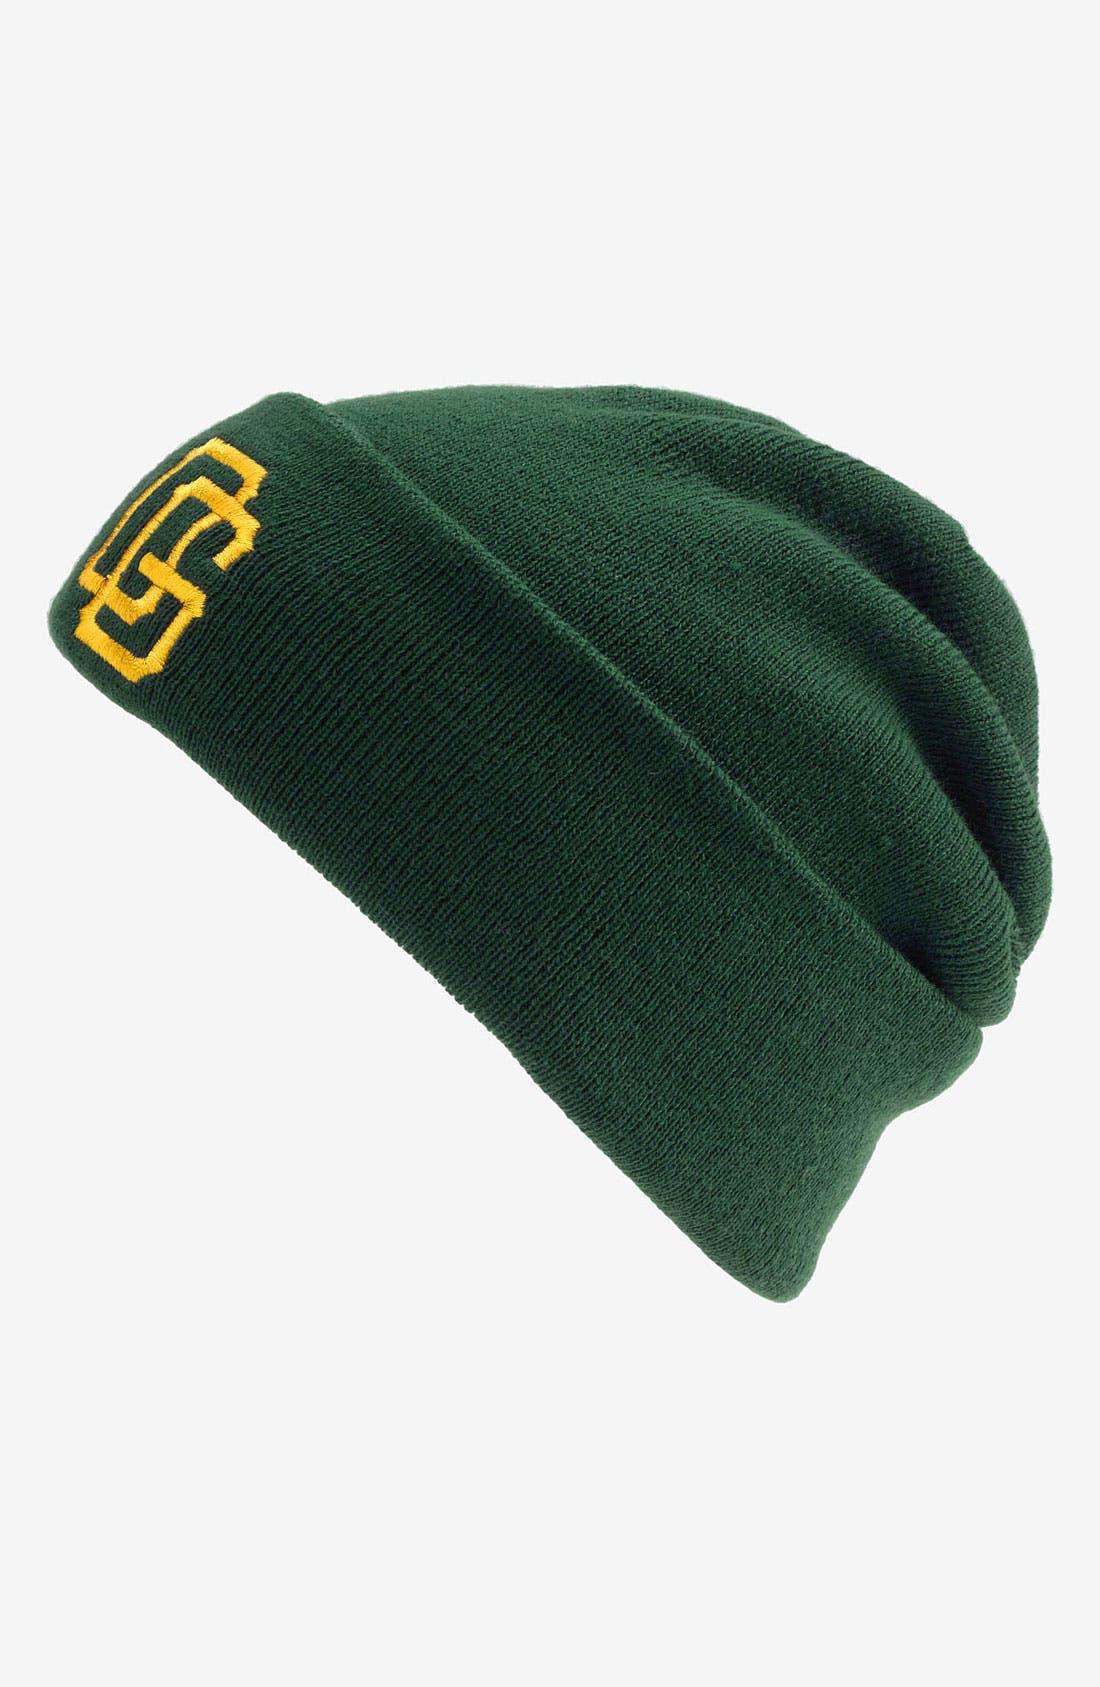 Main Image - Obey 'Double OG' Knit Cap